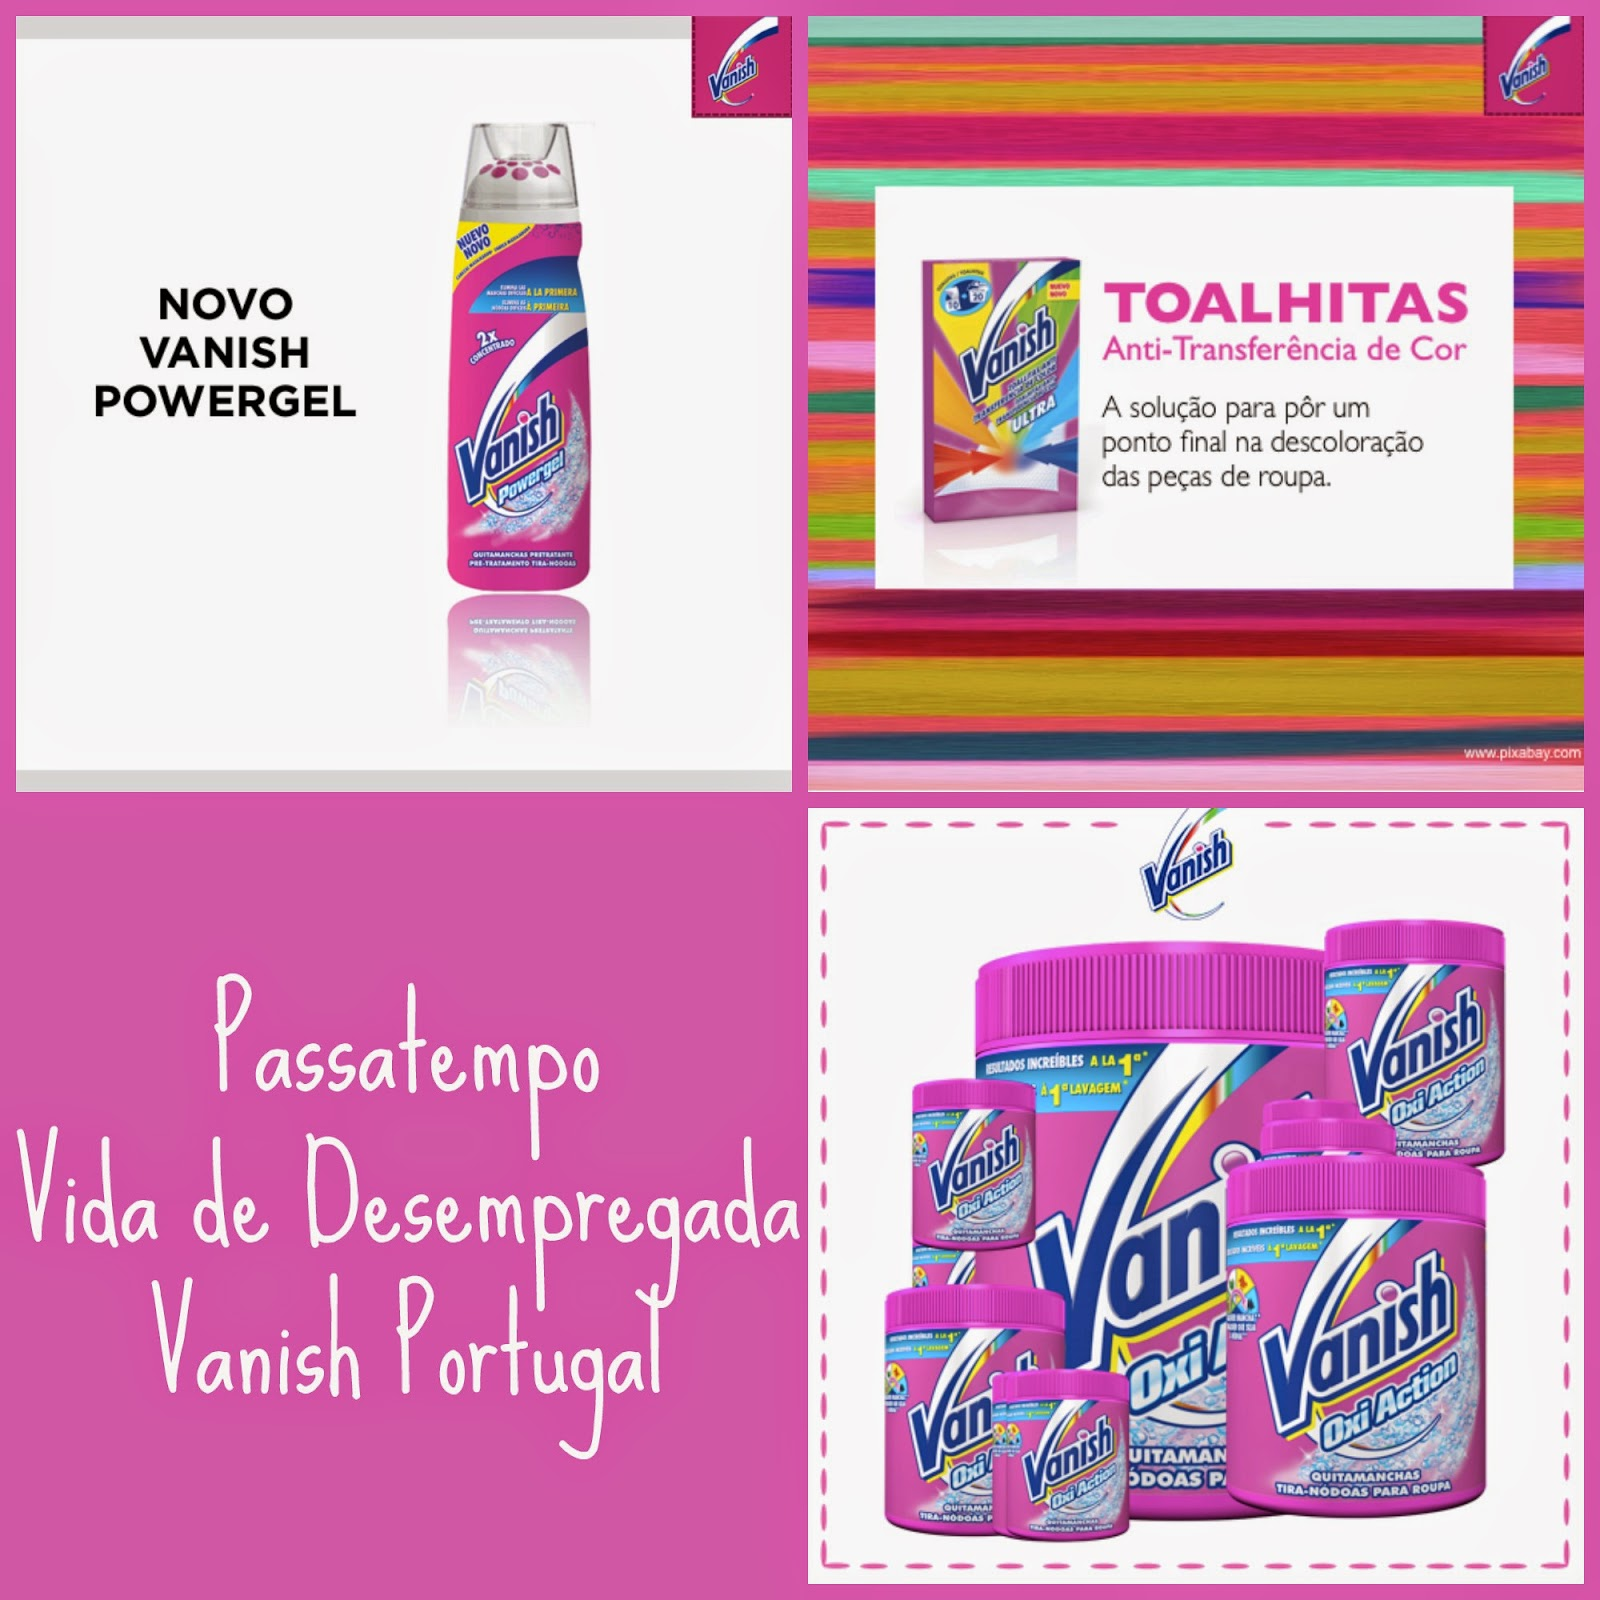 http://vidadedesempregada.blogs.sapo.pt/passatempo-vida-de-desempregada-vanish-164098